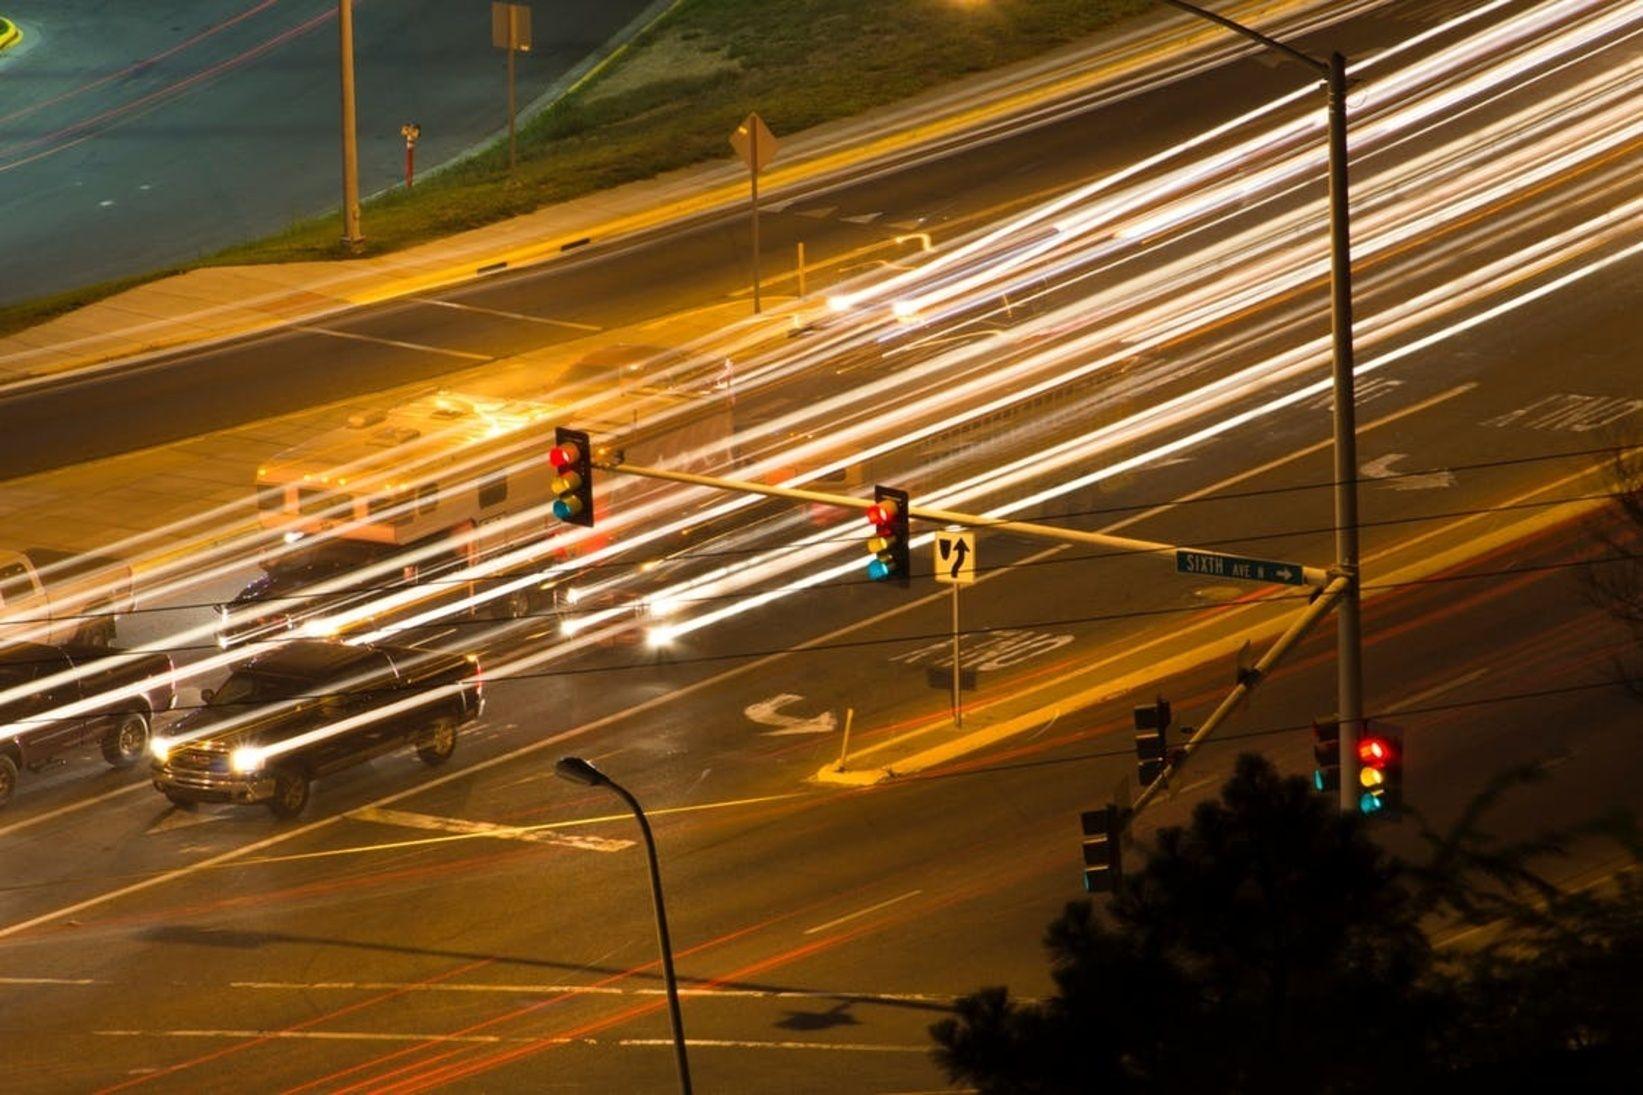 Roads were made for journeys not destinations. #CouponPilots #Like4Like #Inspirational #Motivational